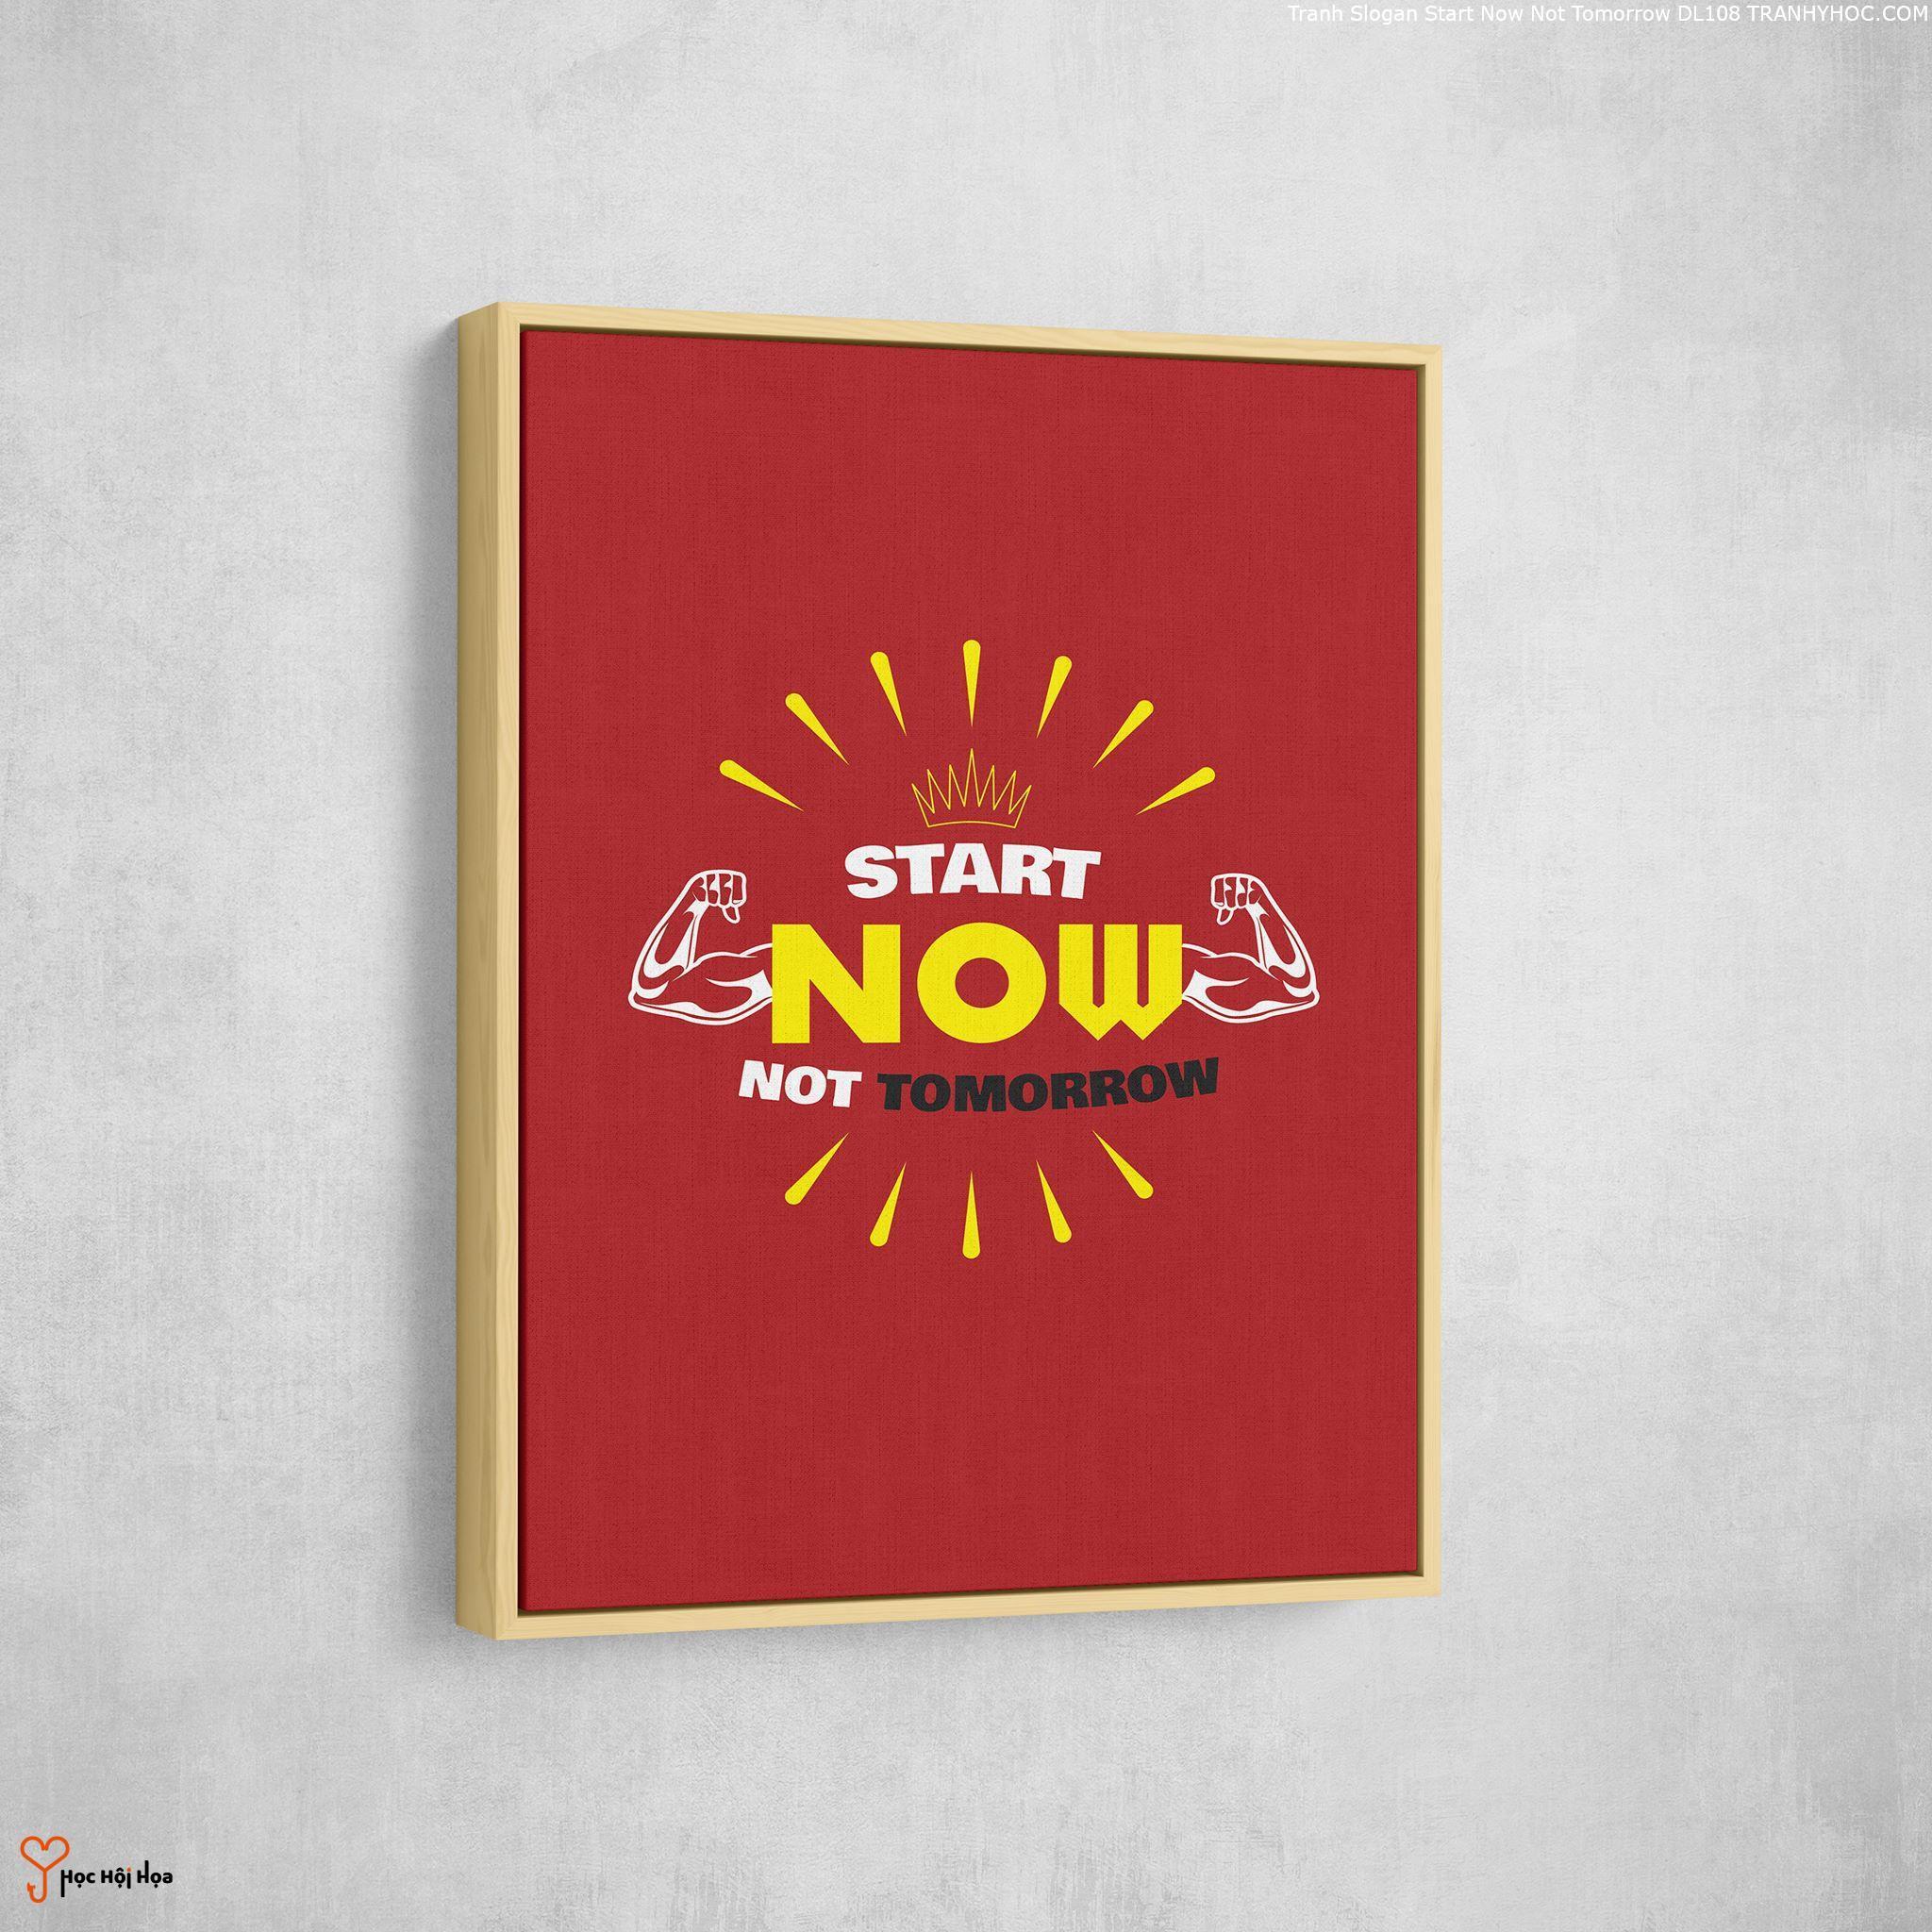 Tranh Slogan Start Now Not Tomorrow DL108